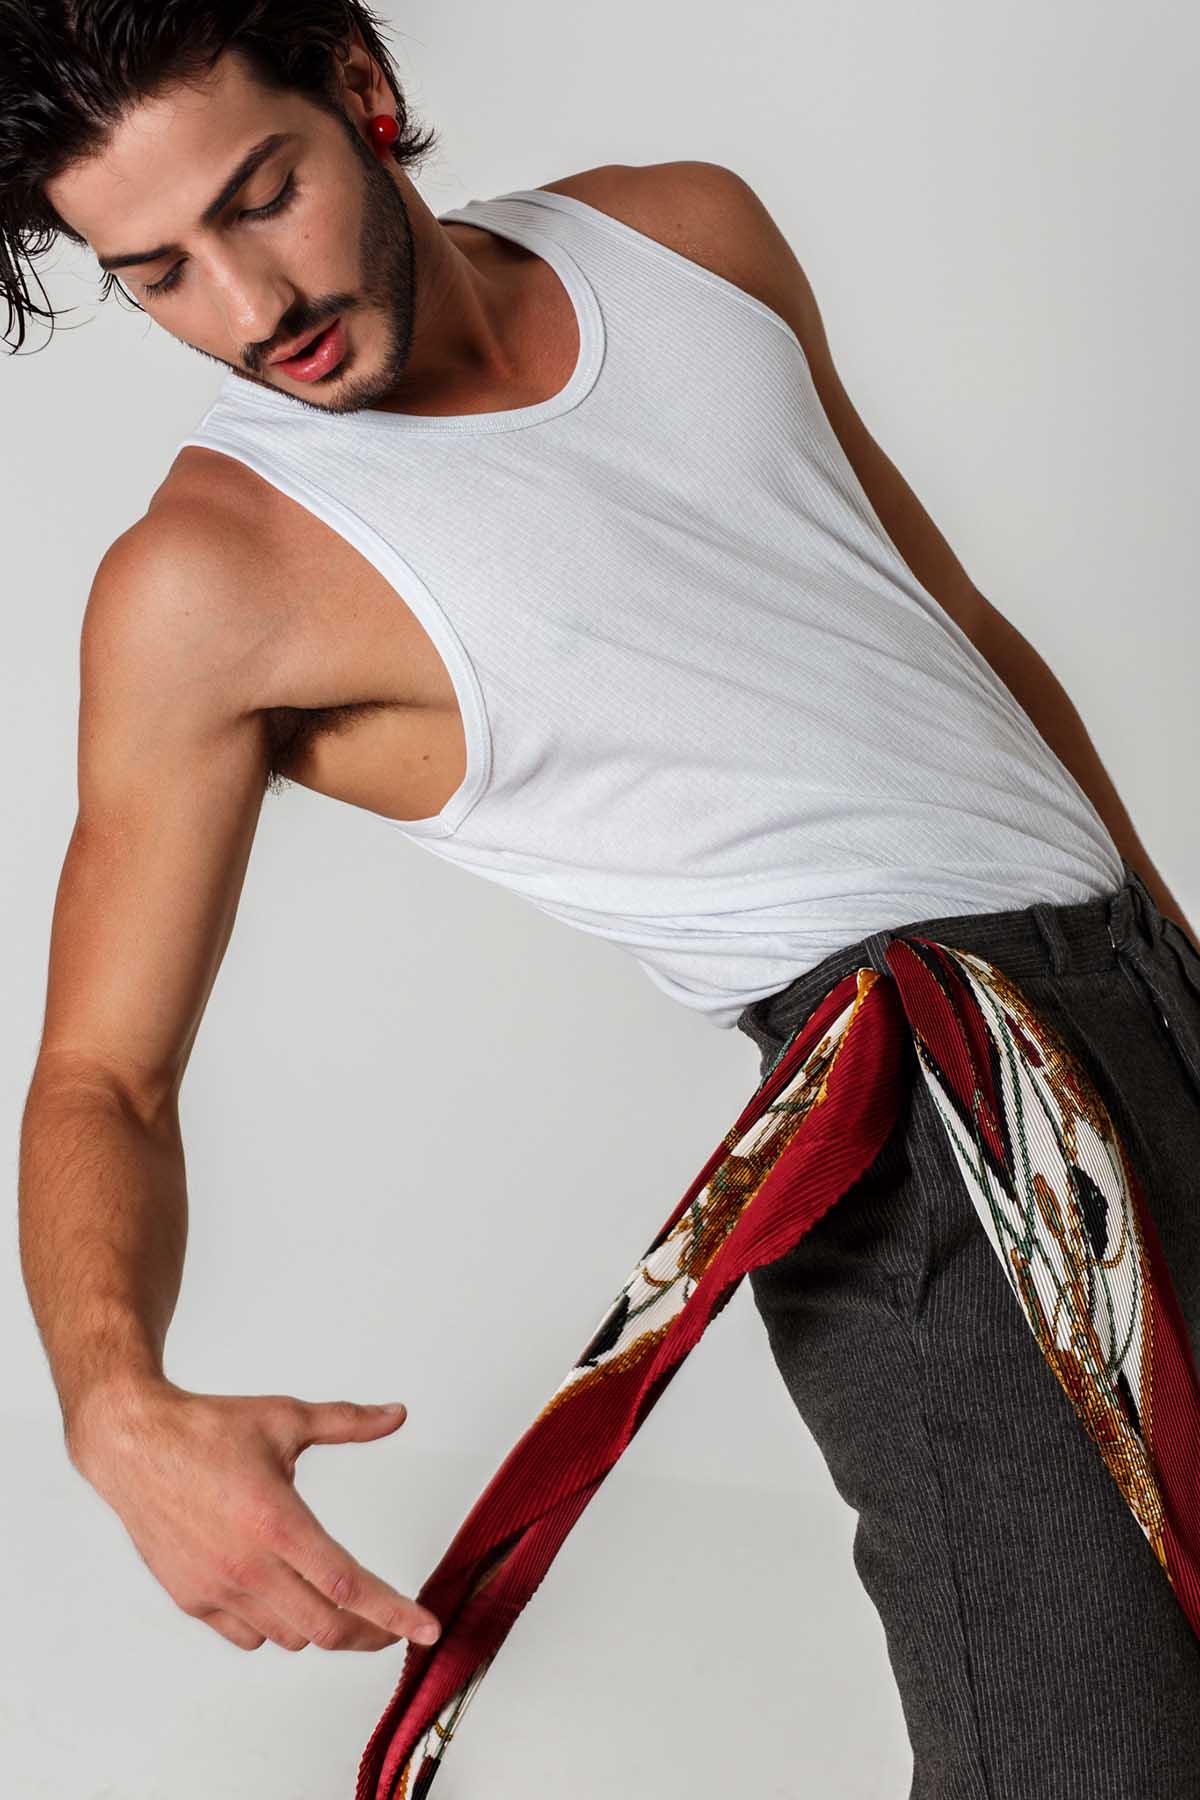 Willian Cavalheiro by Danilo Friedl for Brazilian Male Model